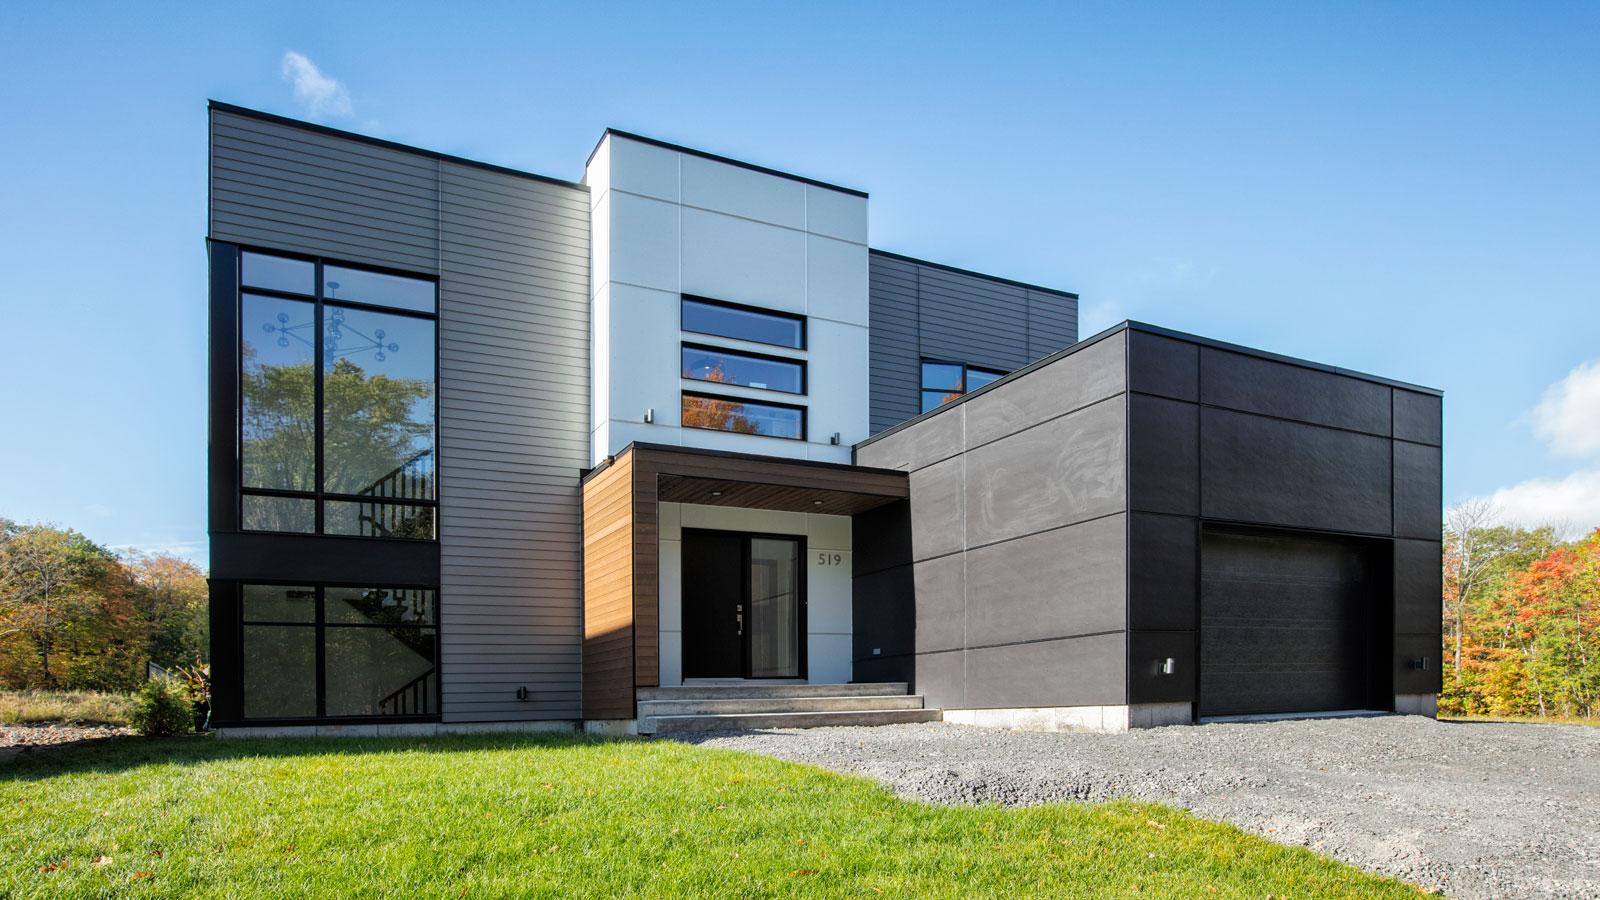 Maison moderne quebec maison moderne maison moderne for Architecte maison moderne quebec